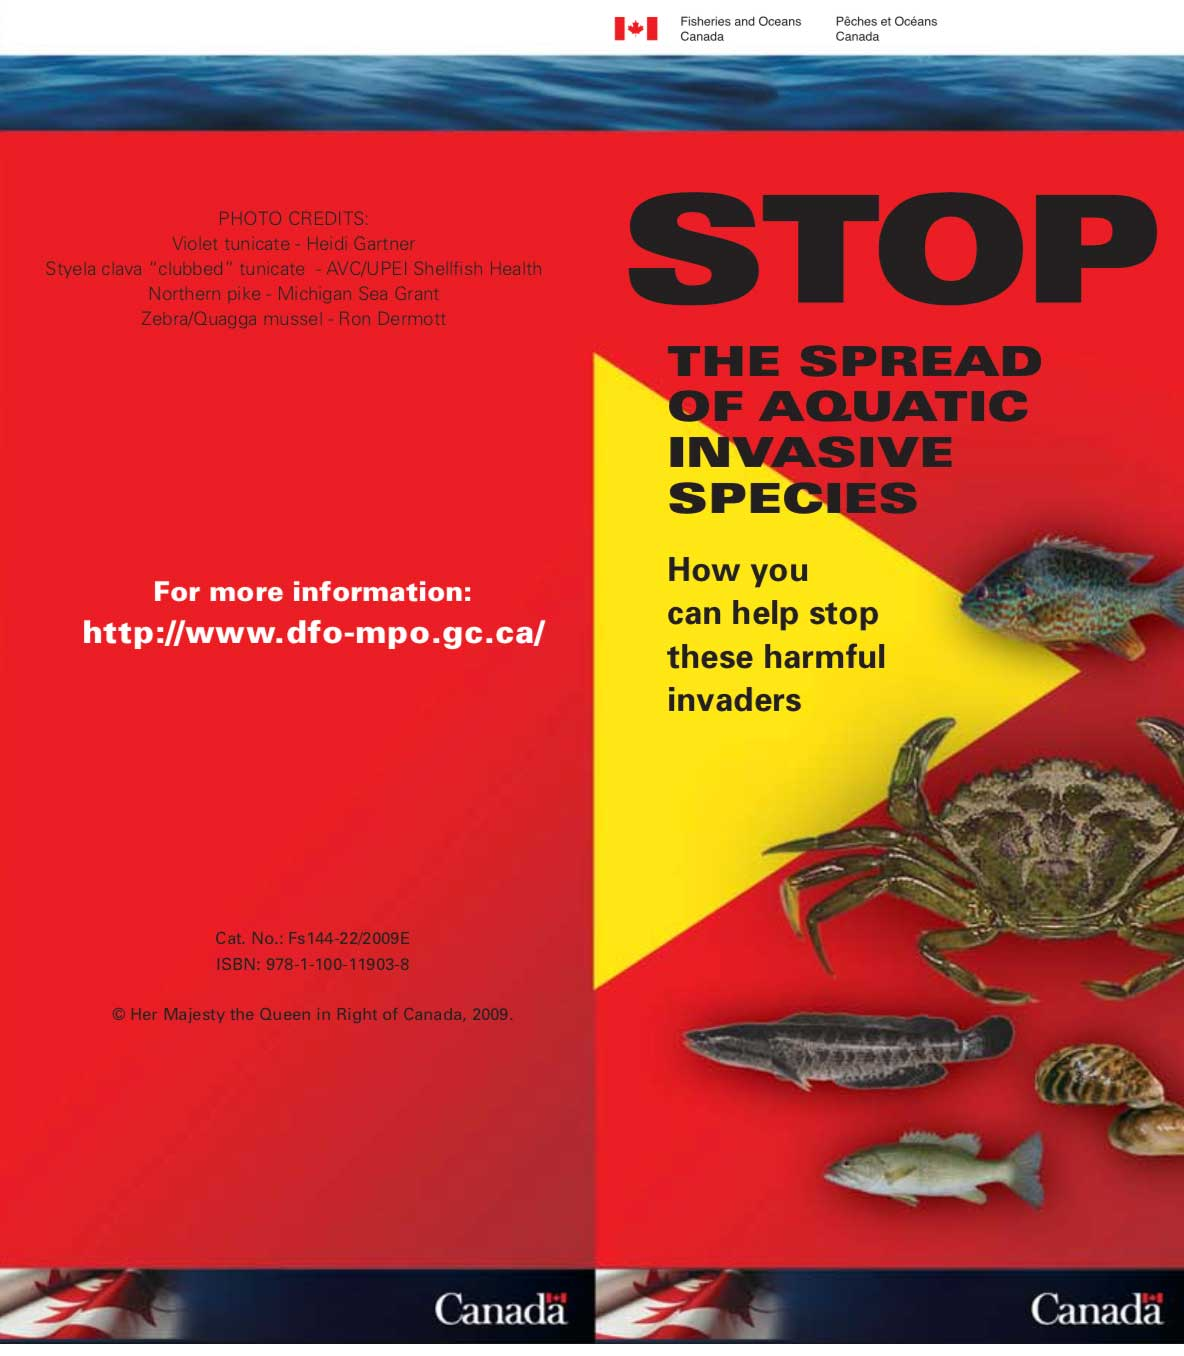 Stop the Spread of Aquatic Invasive Species